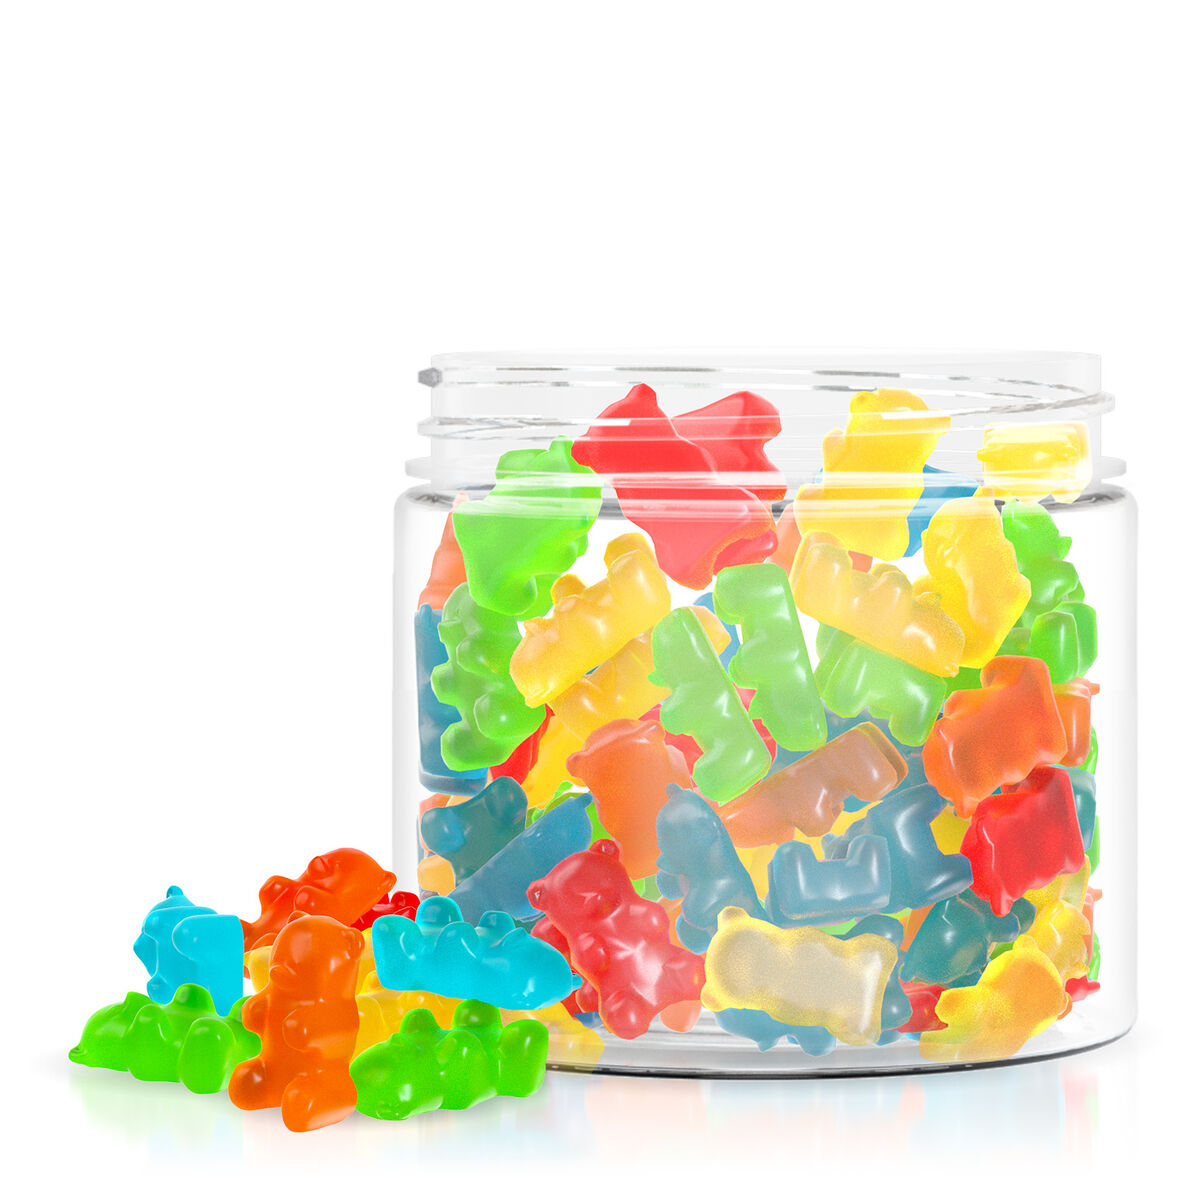 Relax Gummies - CBD Infused Gummy Bears - 1000mg